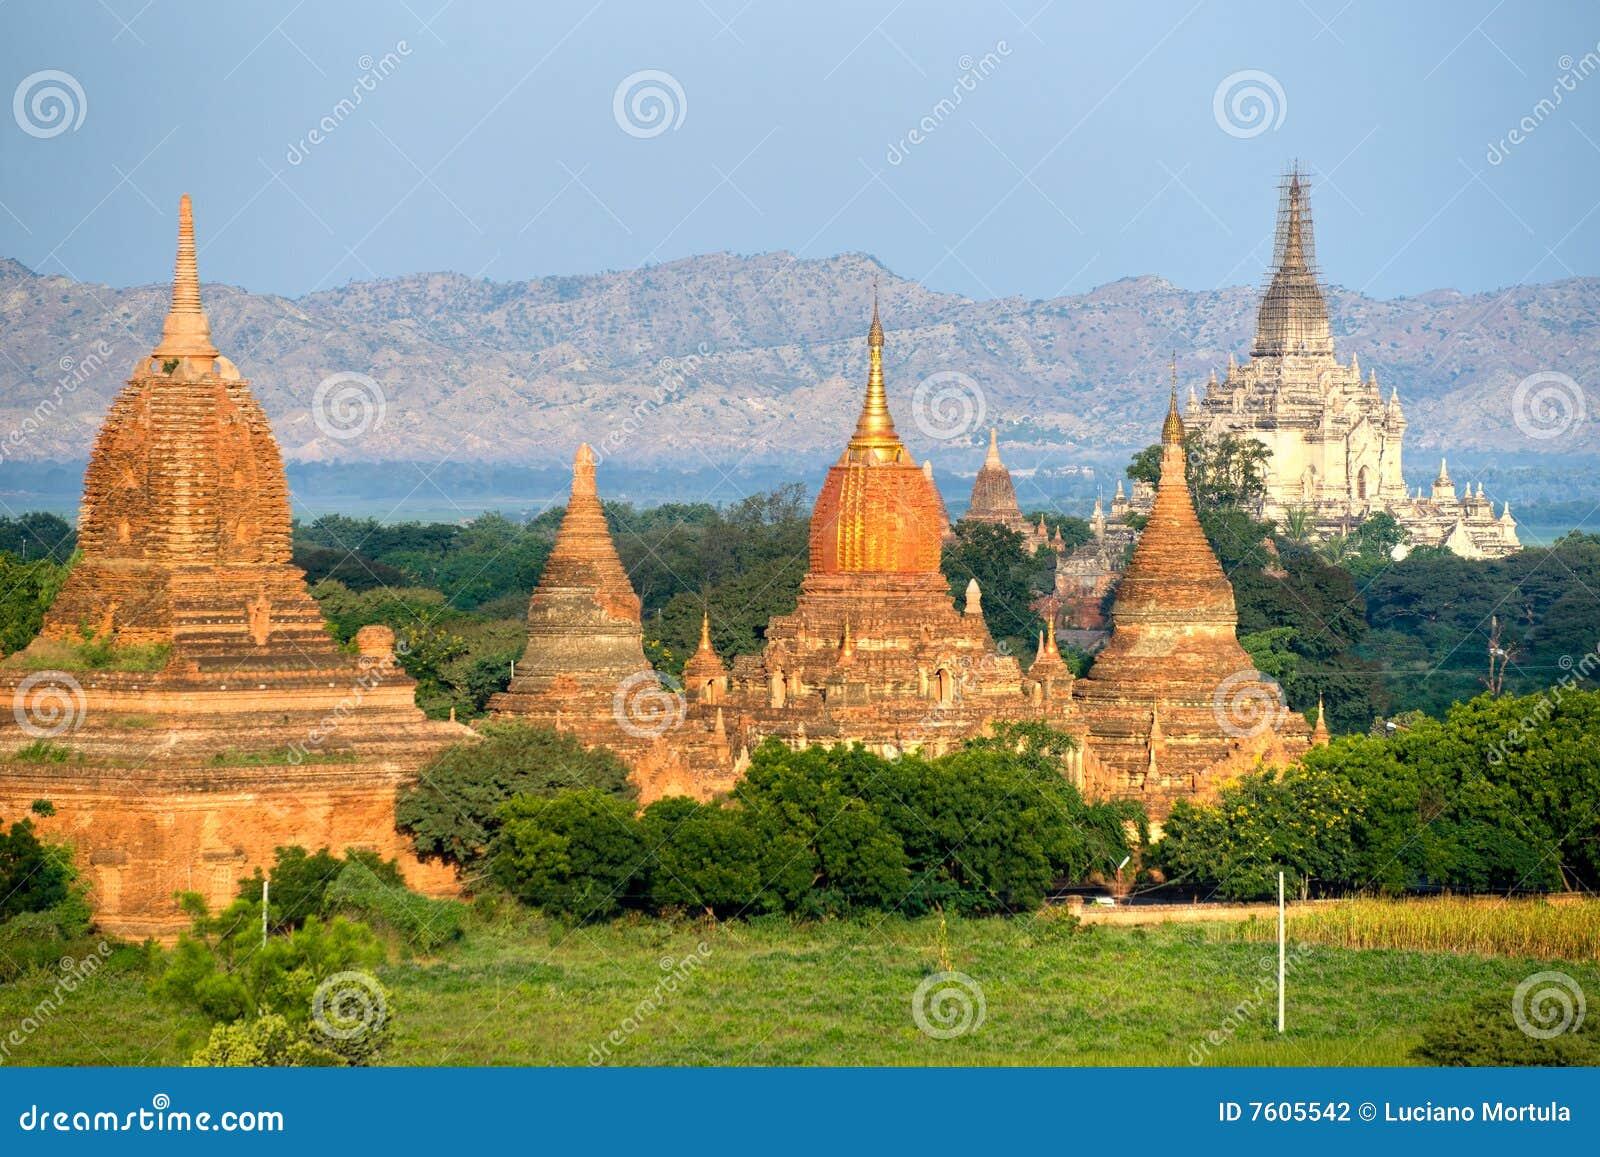 Bagan gawdawpalin缅甸塔pahto